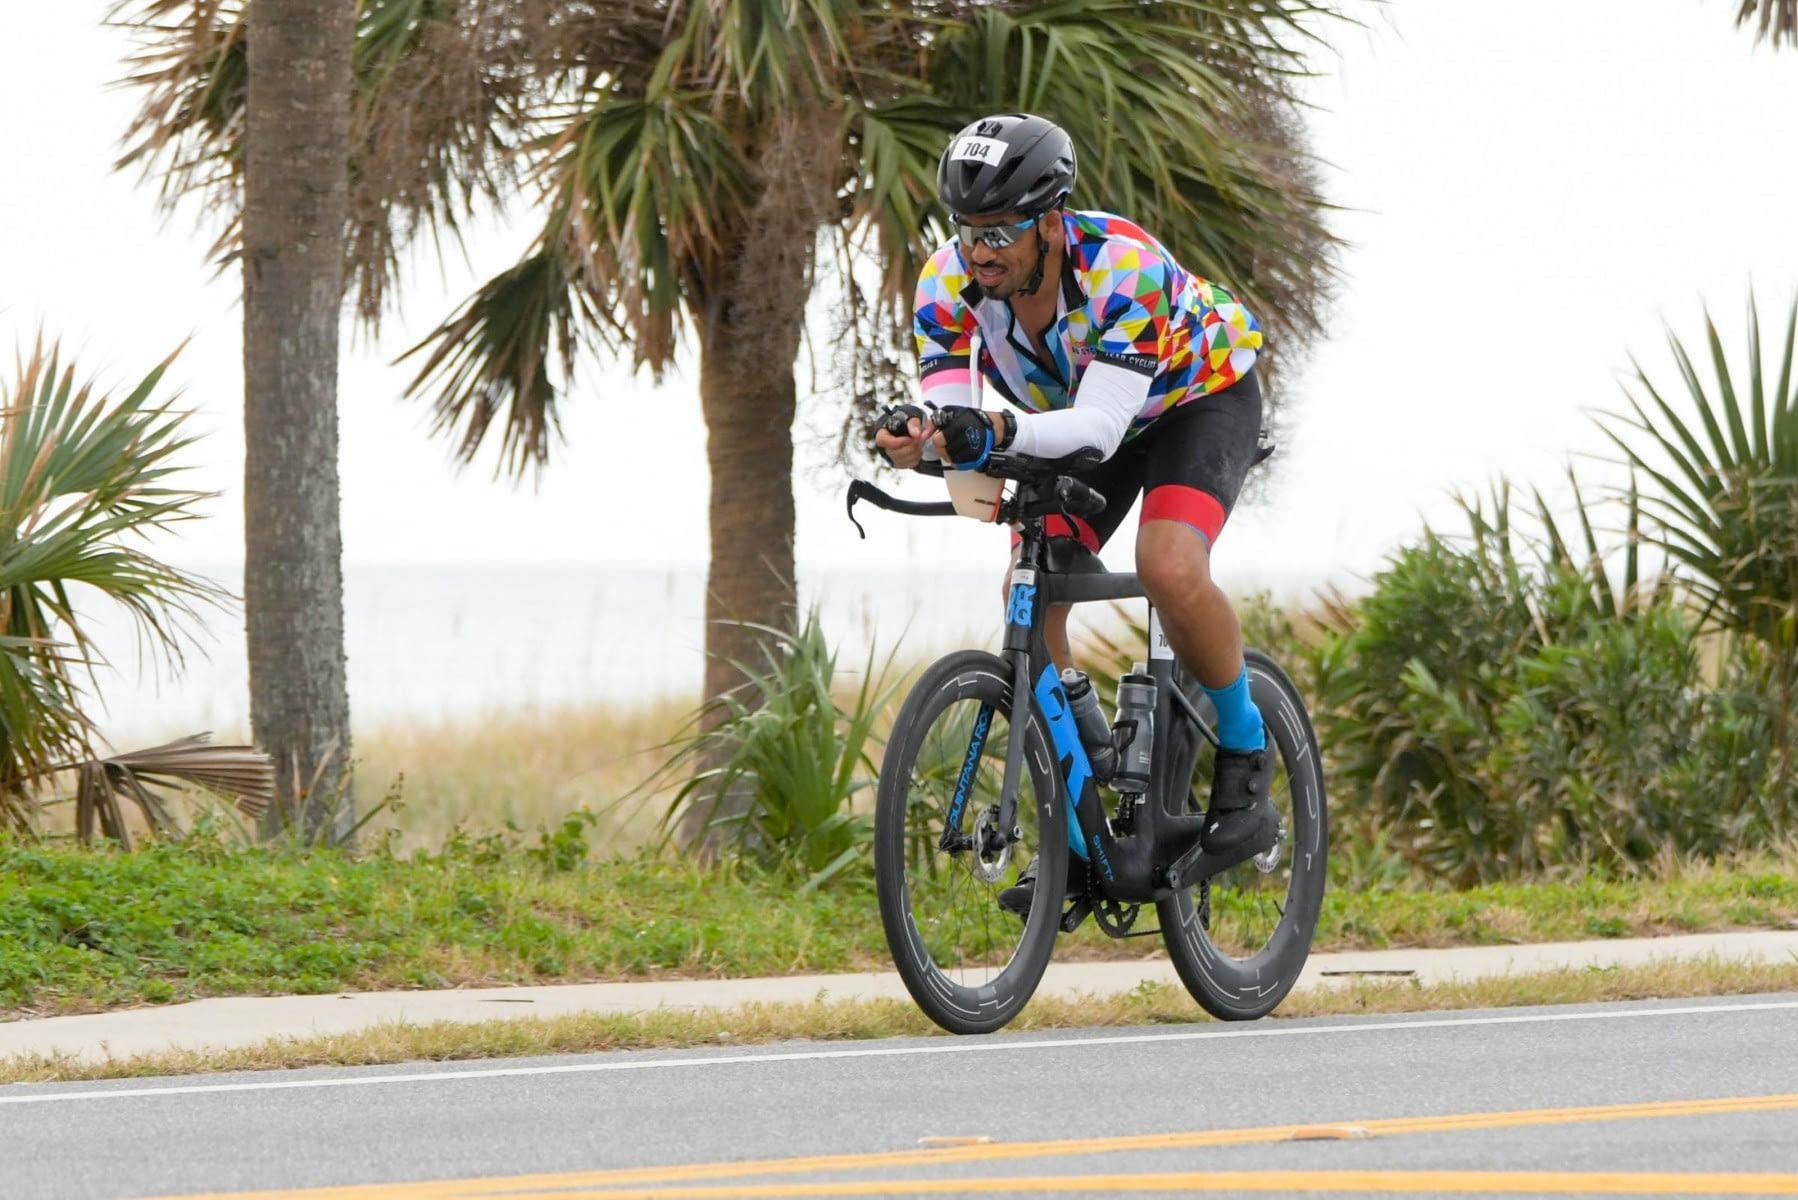 Bike-side-view-16